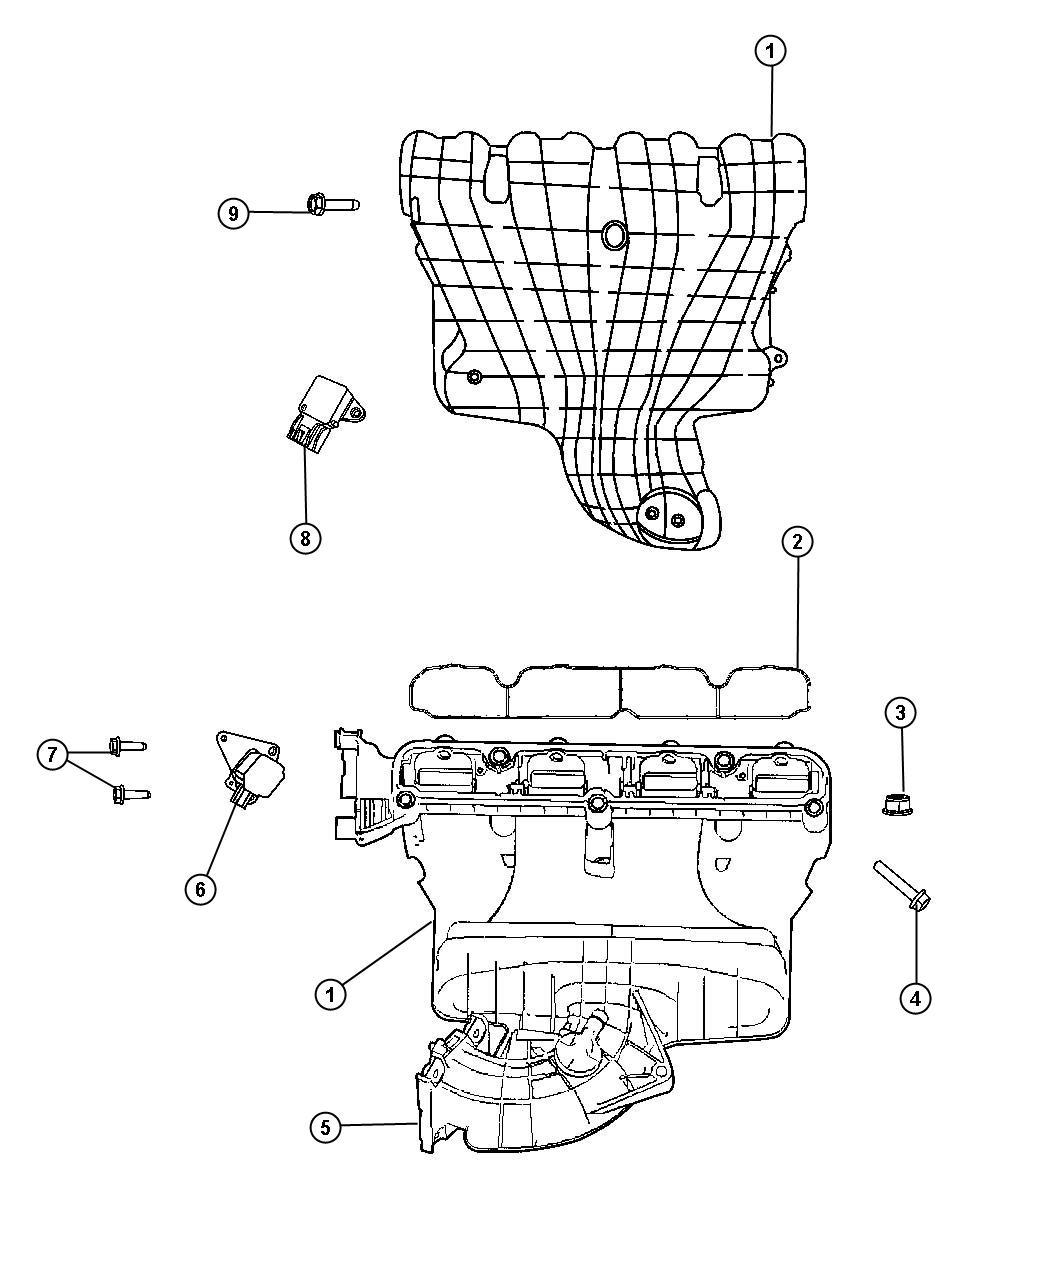 tags: #2000 dodge intrepid engine diagram#dodge intrepid engine#2004 dodge  intrepid 2#dodge intrepid engine problems#chrysler 2#2001 dodge intrepid  engine